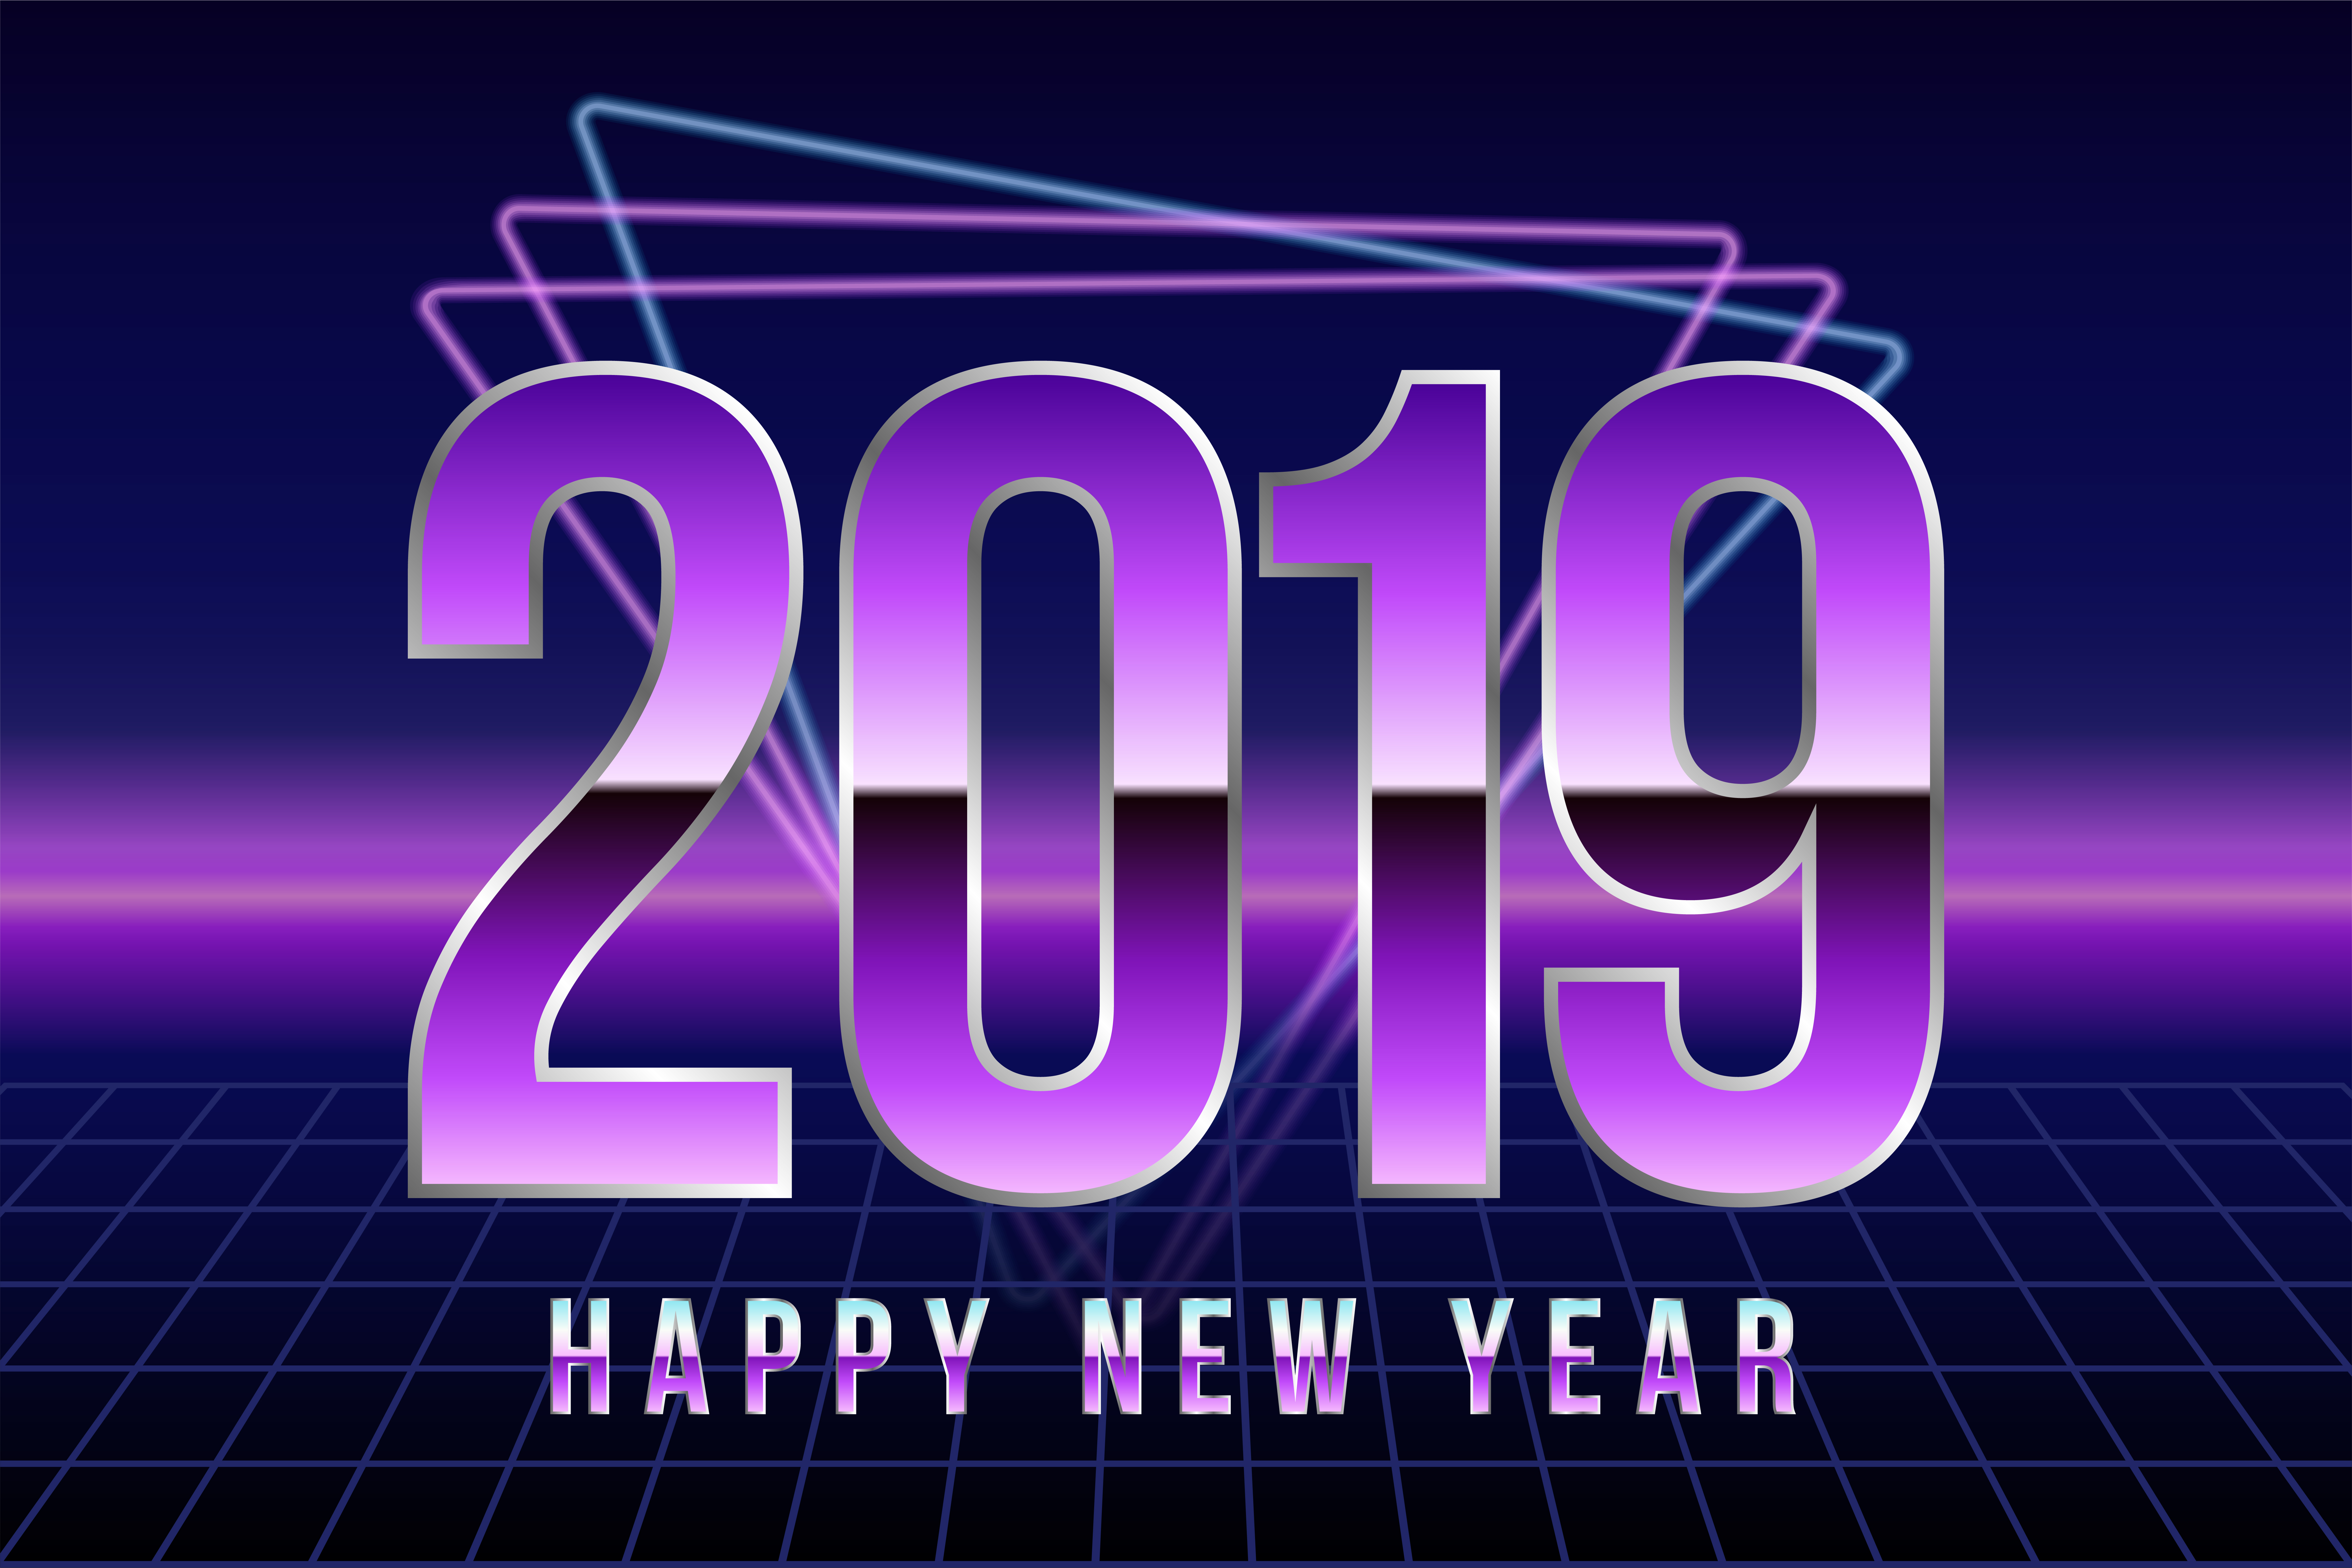 Happy New 2019 Year Vectot Illustration In Retro Disco